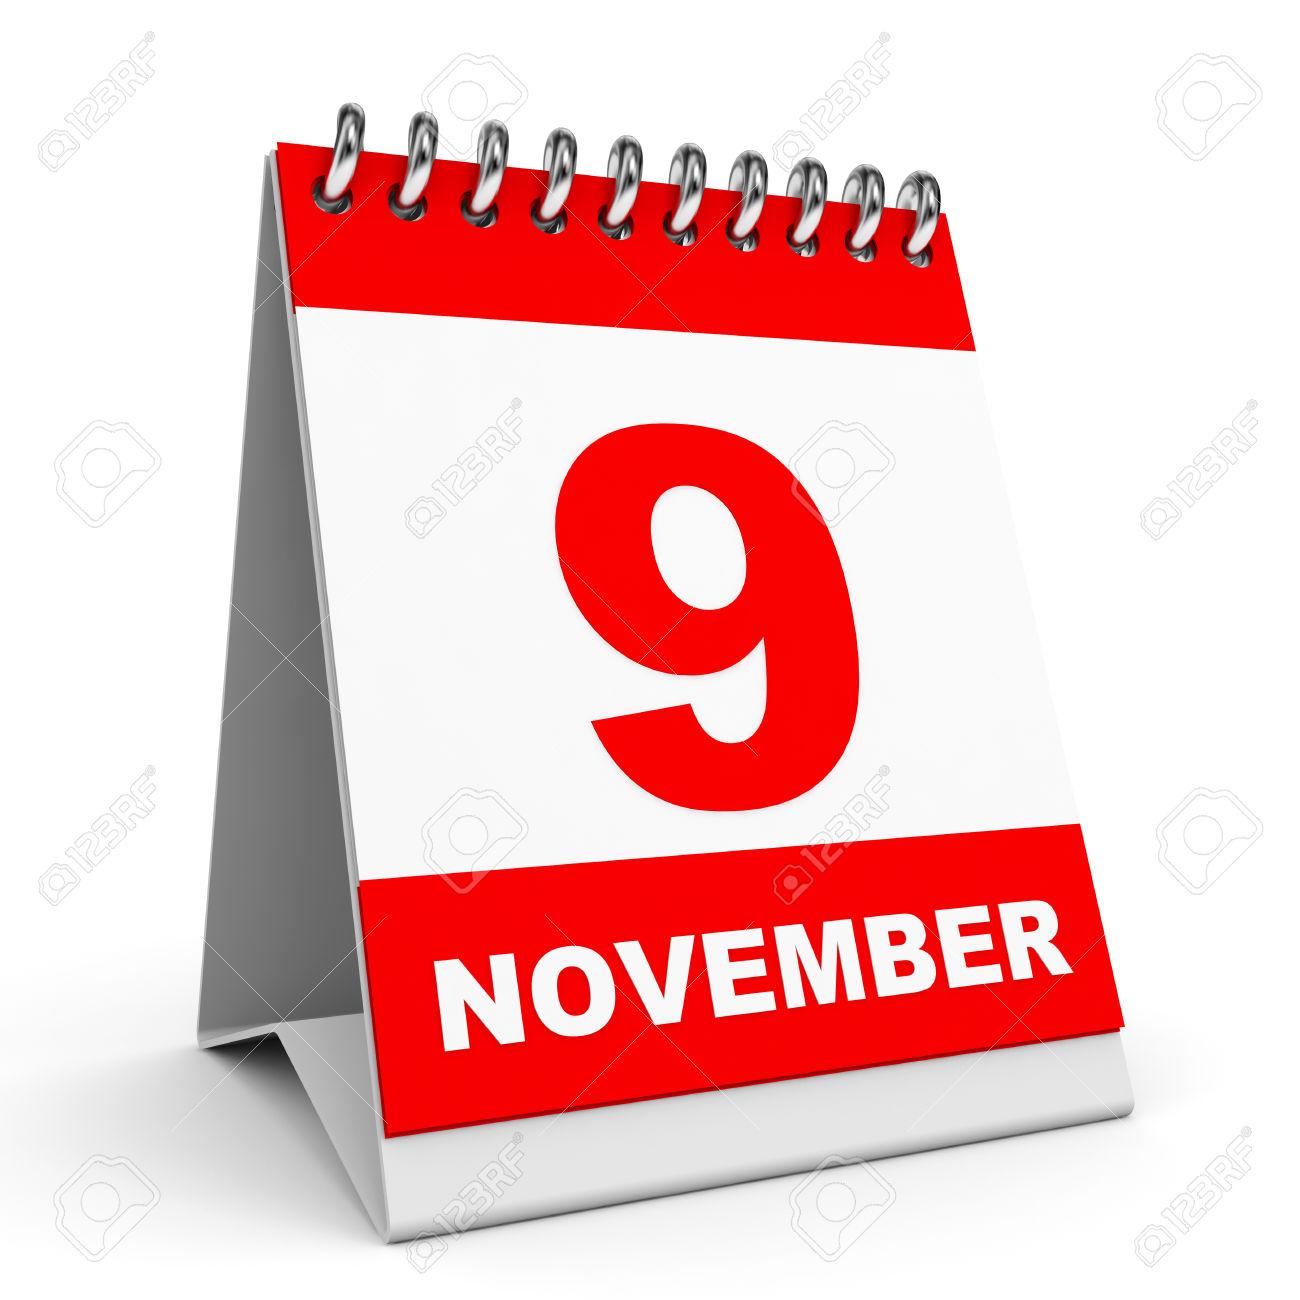 November 9th calendar clipart clip free library Calendar On White Background. 9 November. 3D Illustration. Stock ... clip free library